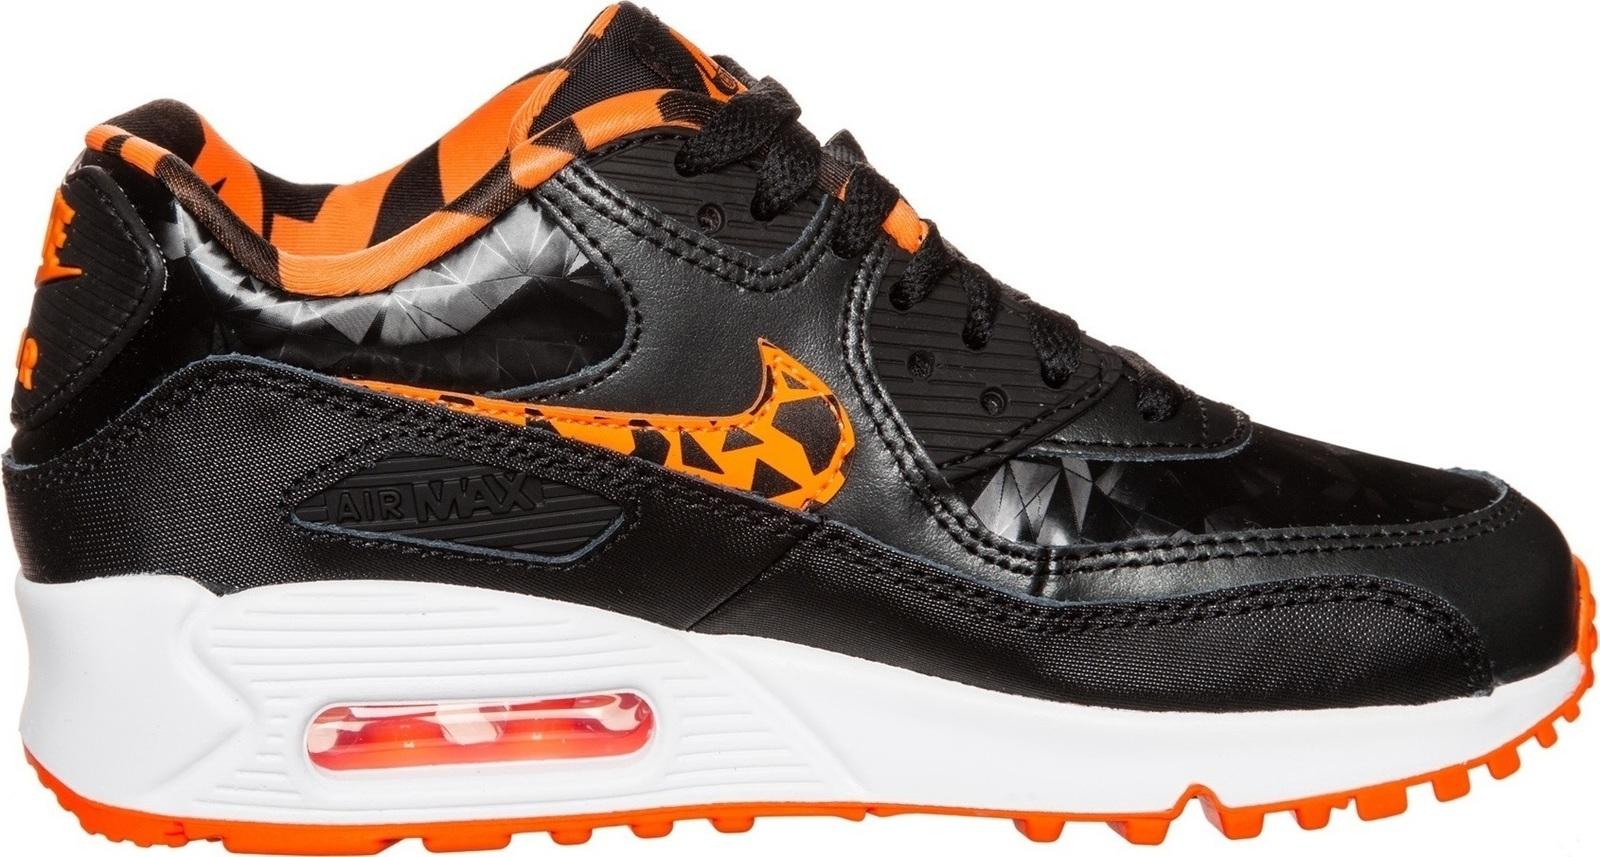 best sneakers 749c6 fcade Προσθήκη στα αγαπημένα menu Nike Air Max 90 FB GS 705392-002